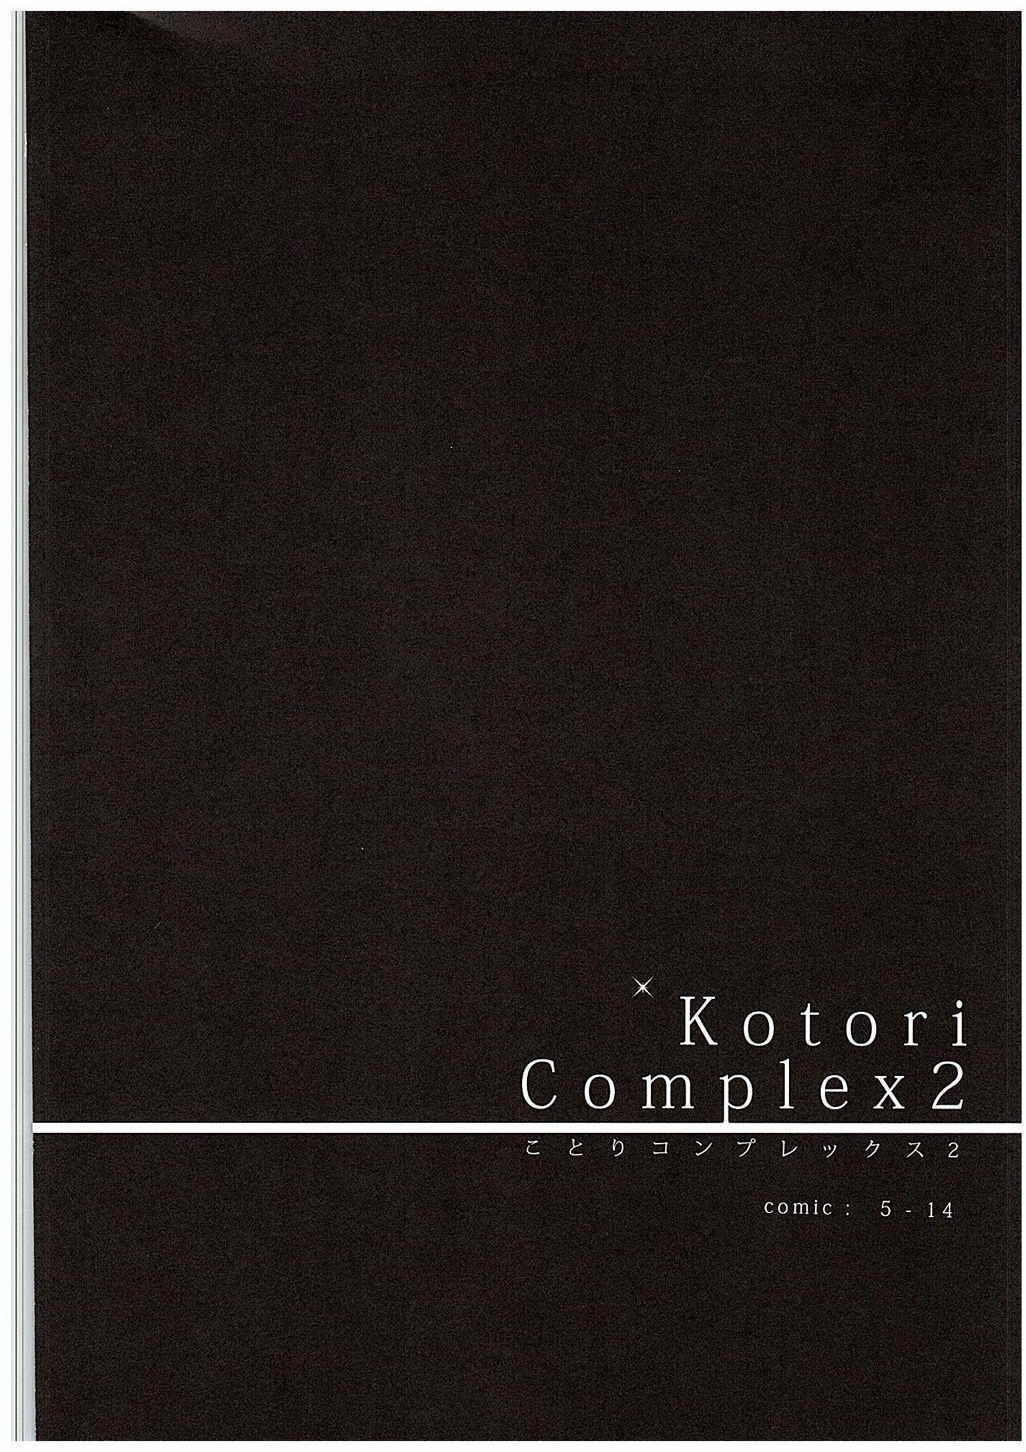 Kotori Complex2 2